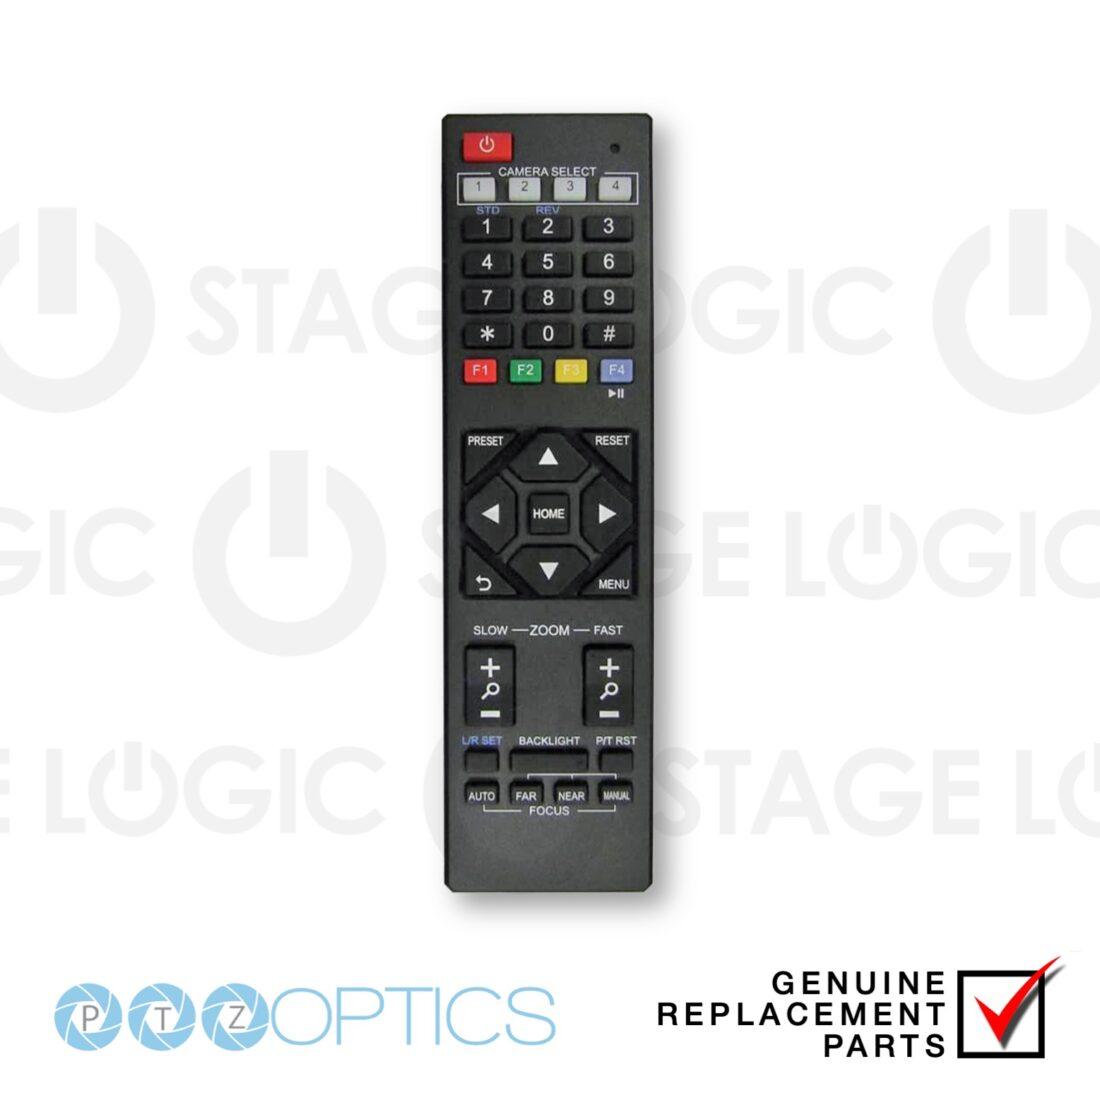 PTZOptics replacement remote